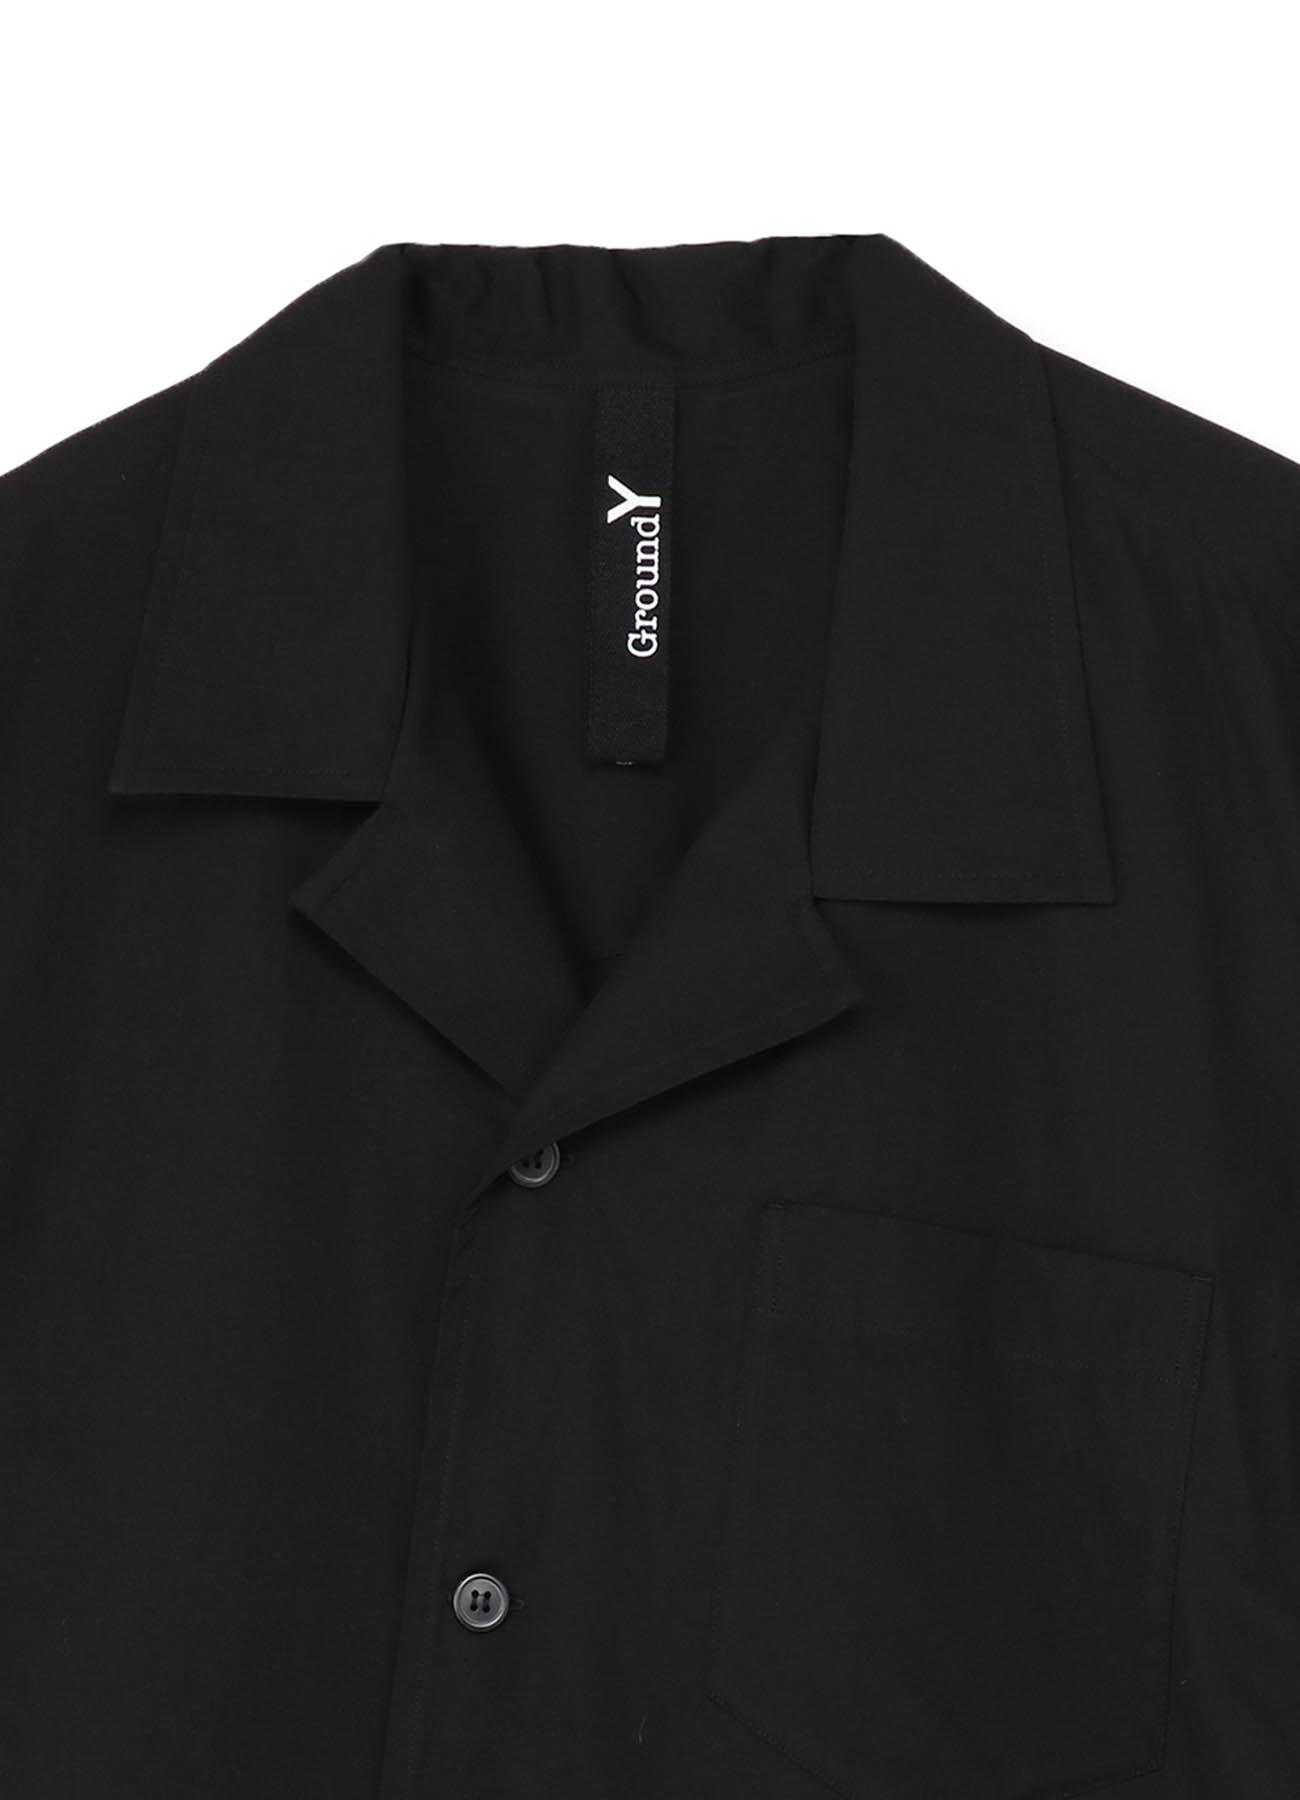 100/2 Cotton Broad Asymmetry Short Sleeves Open Collar Shirt